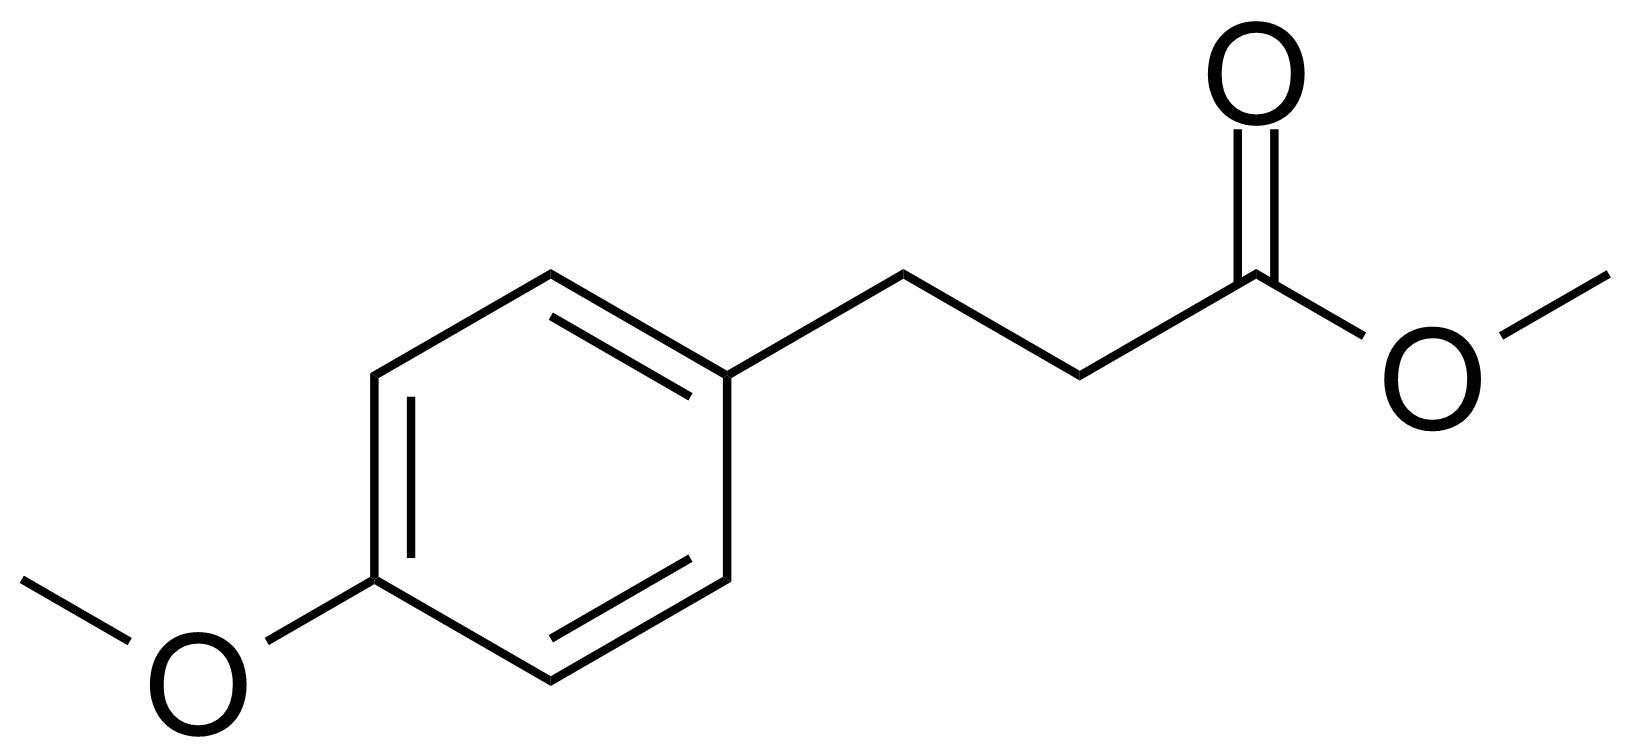 Structure of Methyl 3-(4-methoxyphenyl)propionate